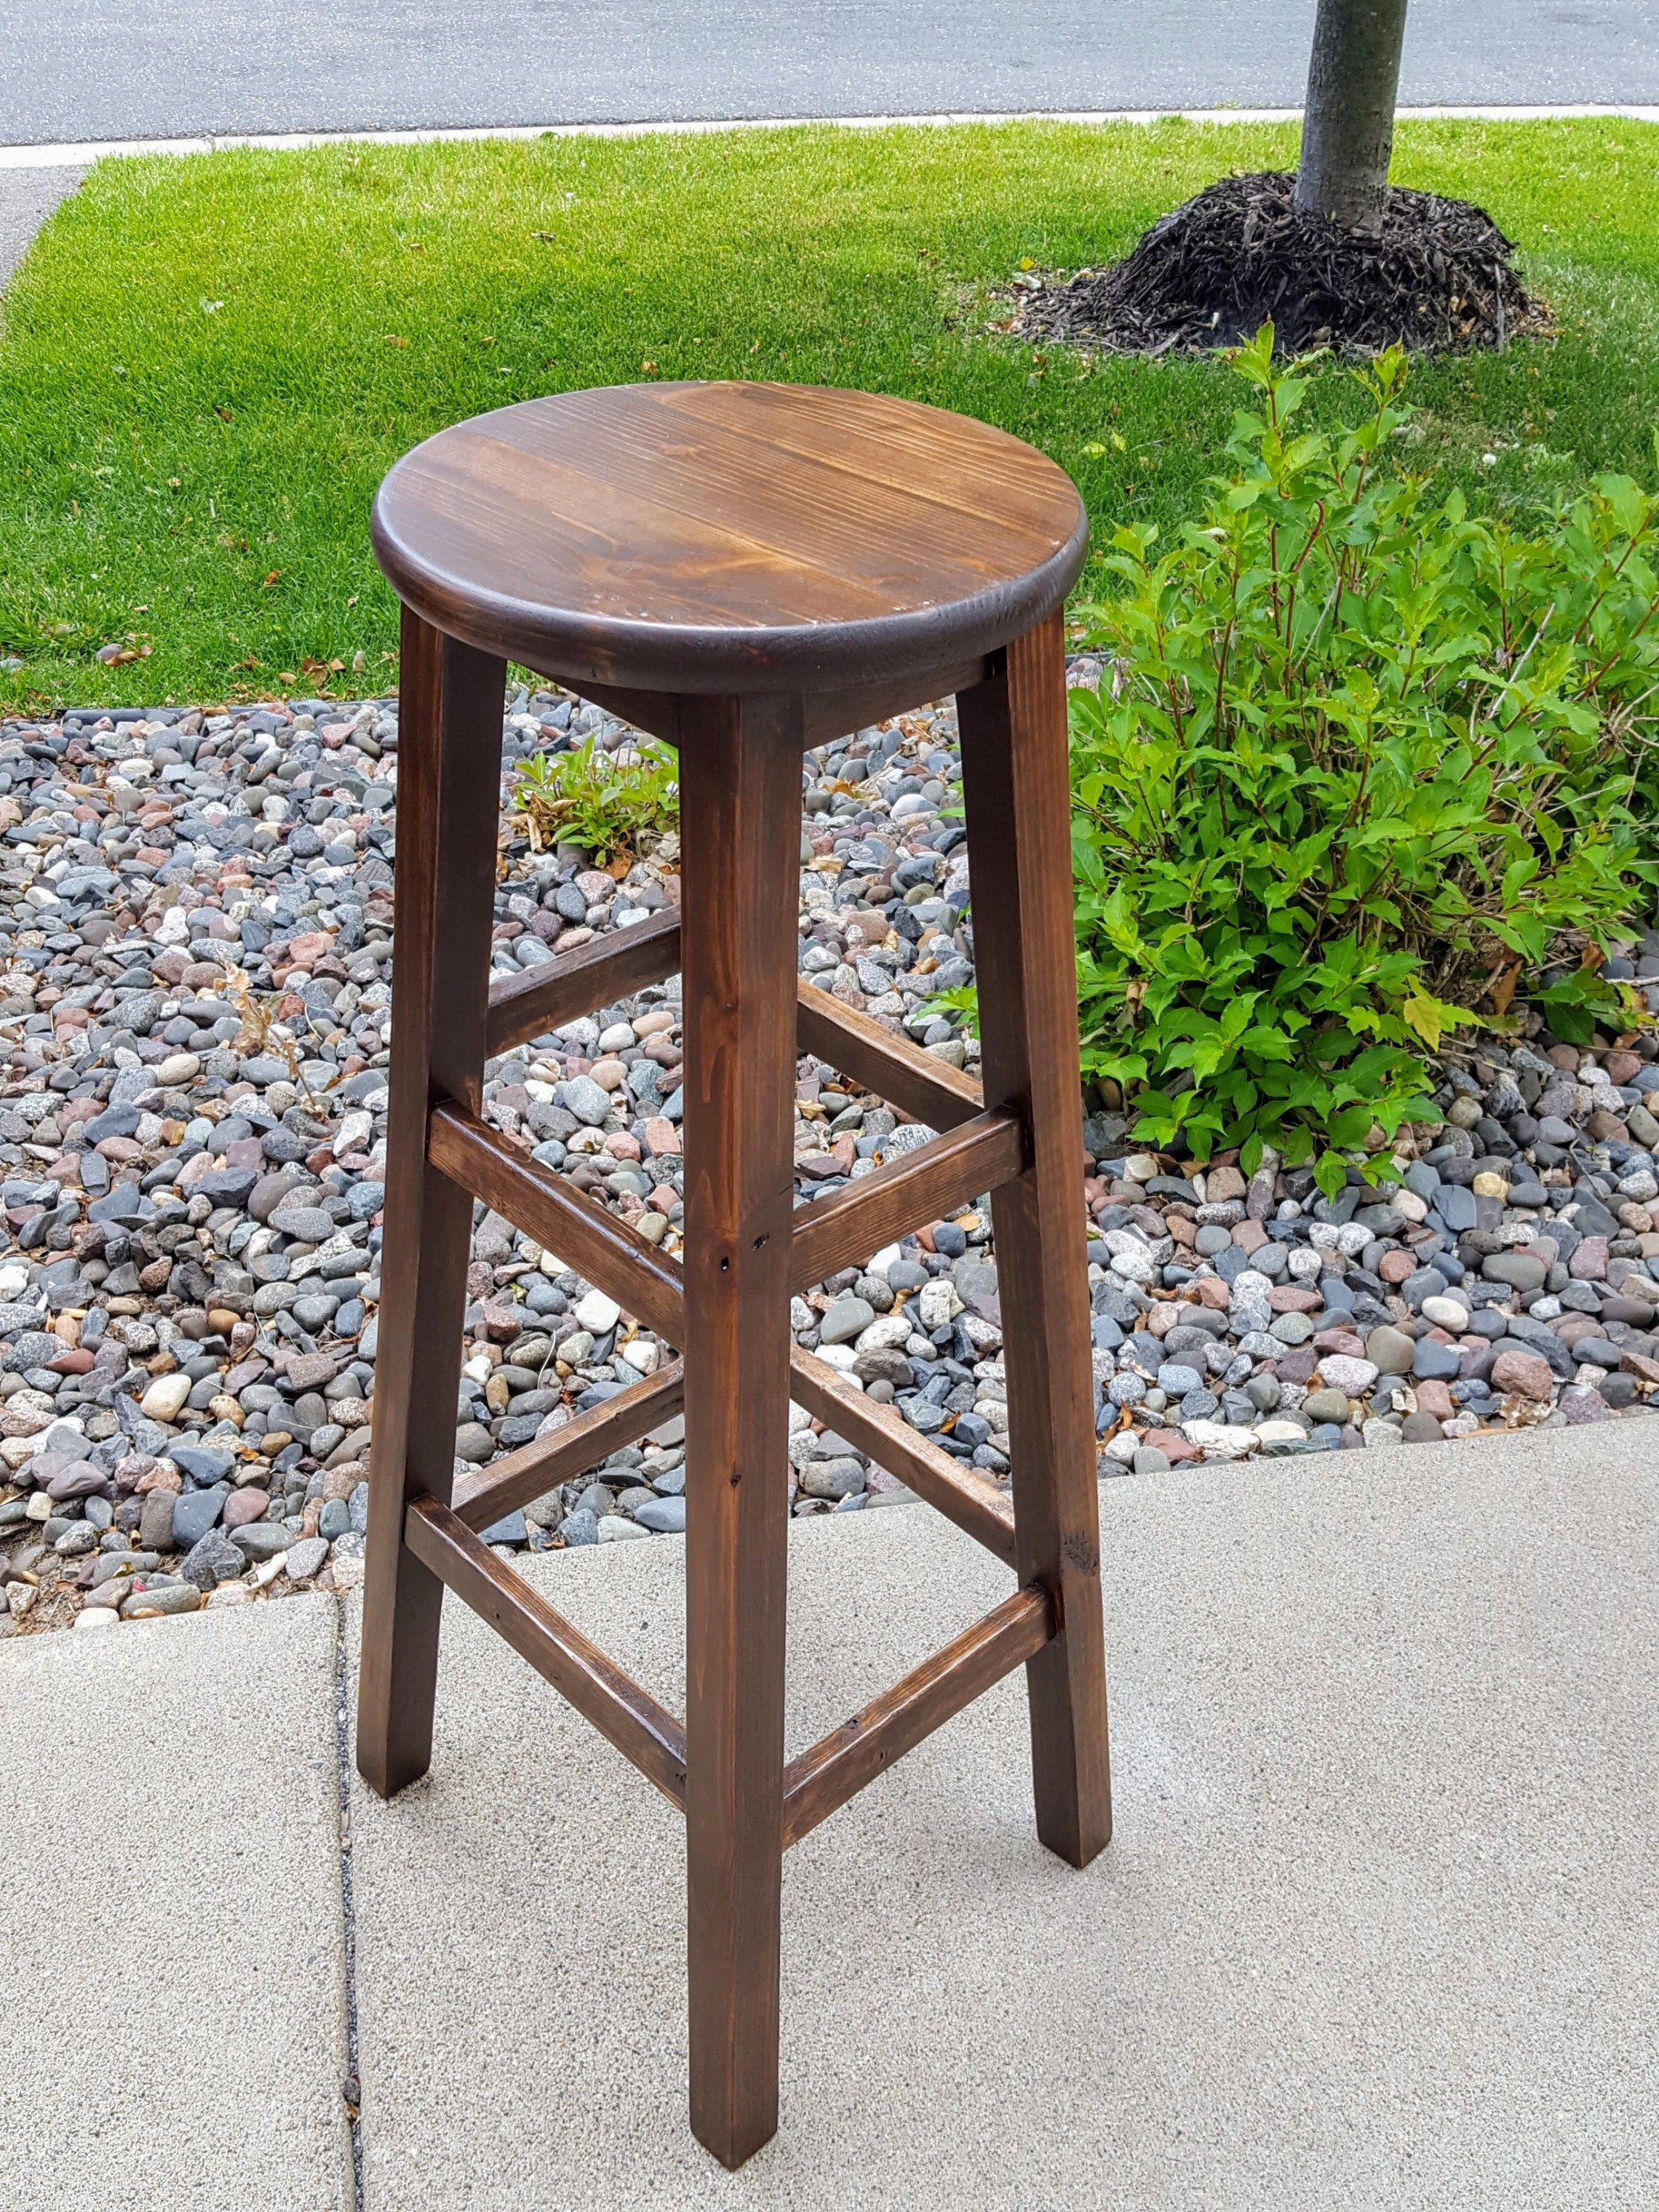 Diy Basic Bar Stools Bar Stools Bar Chairs Diy Diy Bar Stools